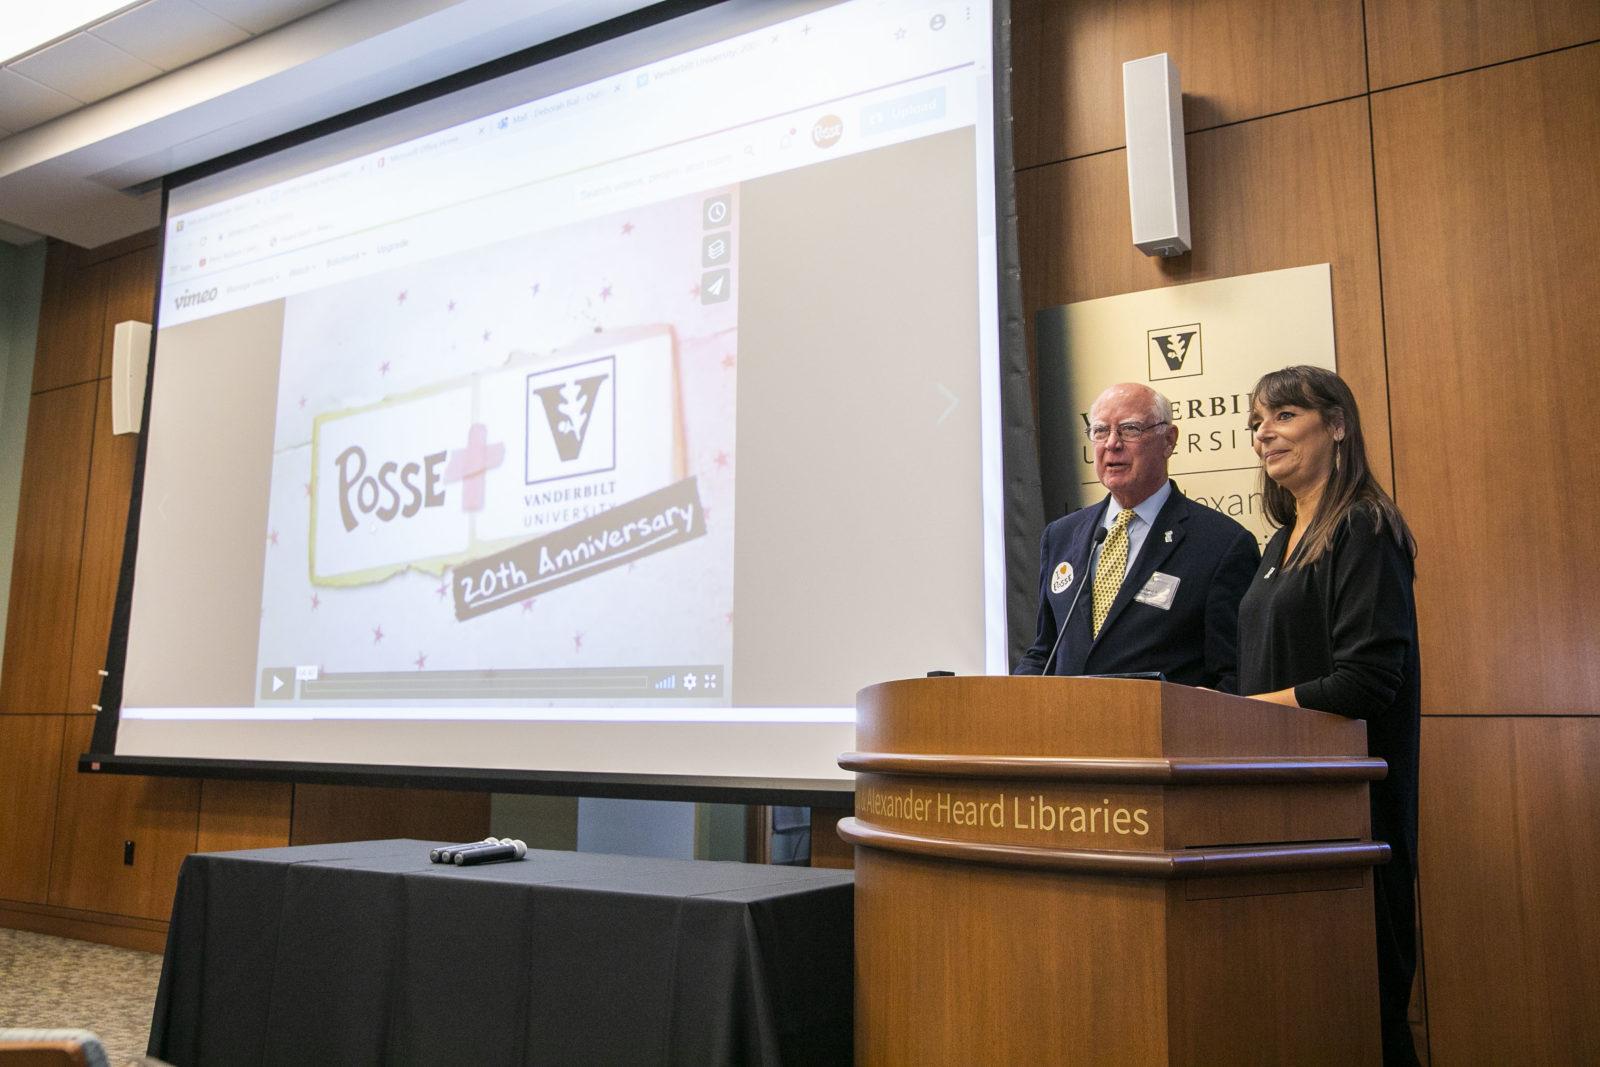 Deborah Bial, Posse's president and founder, and Michael Ainslie, trustee emeritus at Vanderbilt University spoke at the Posse 30th anniversary event. (Anne Rayner/Vanderbilt)